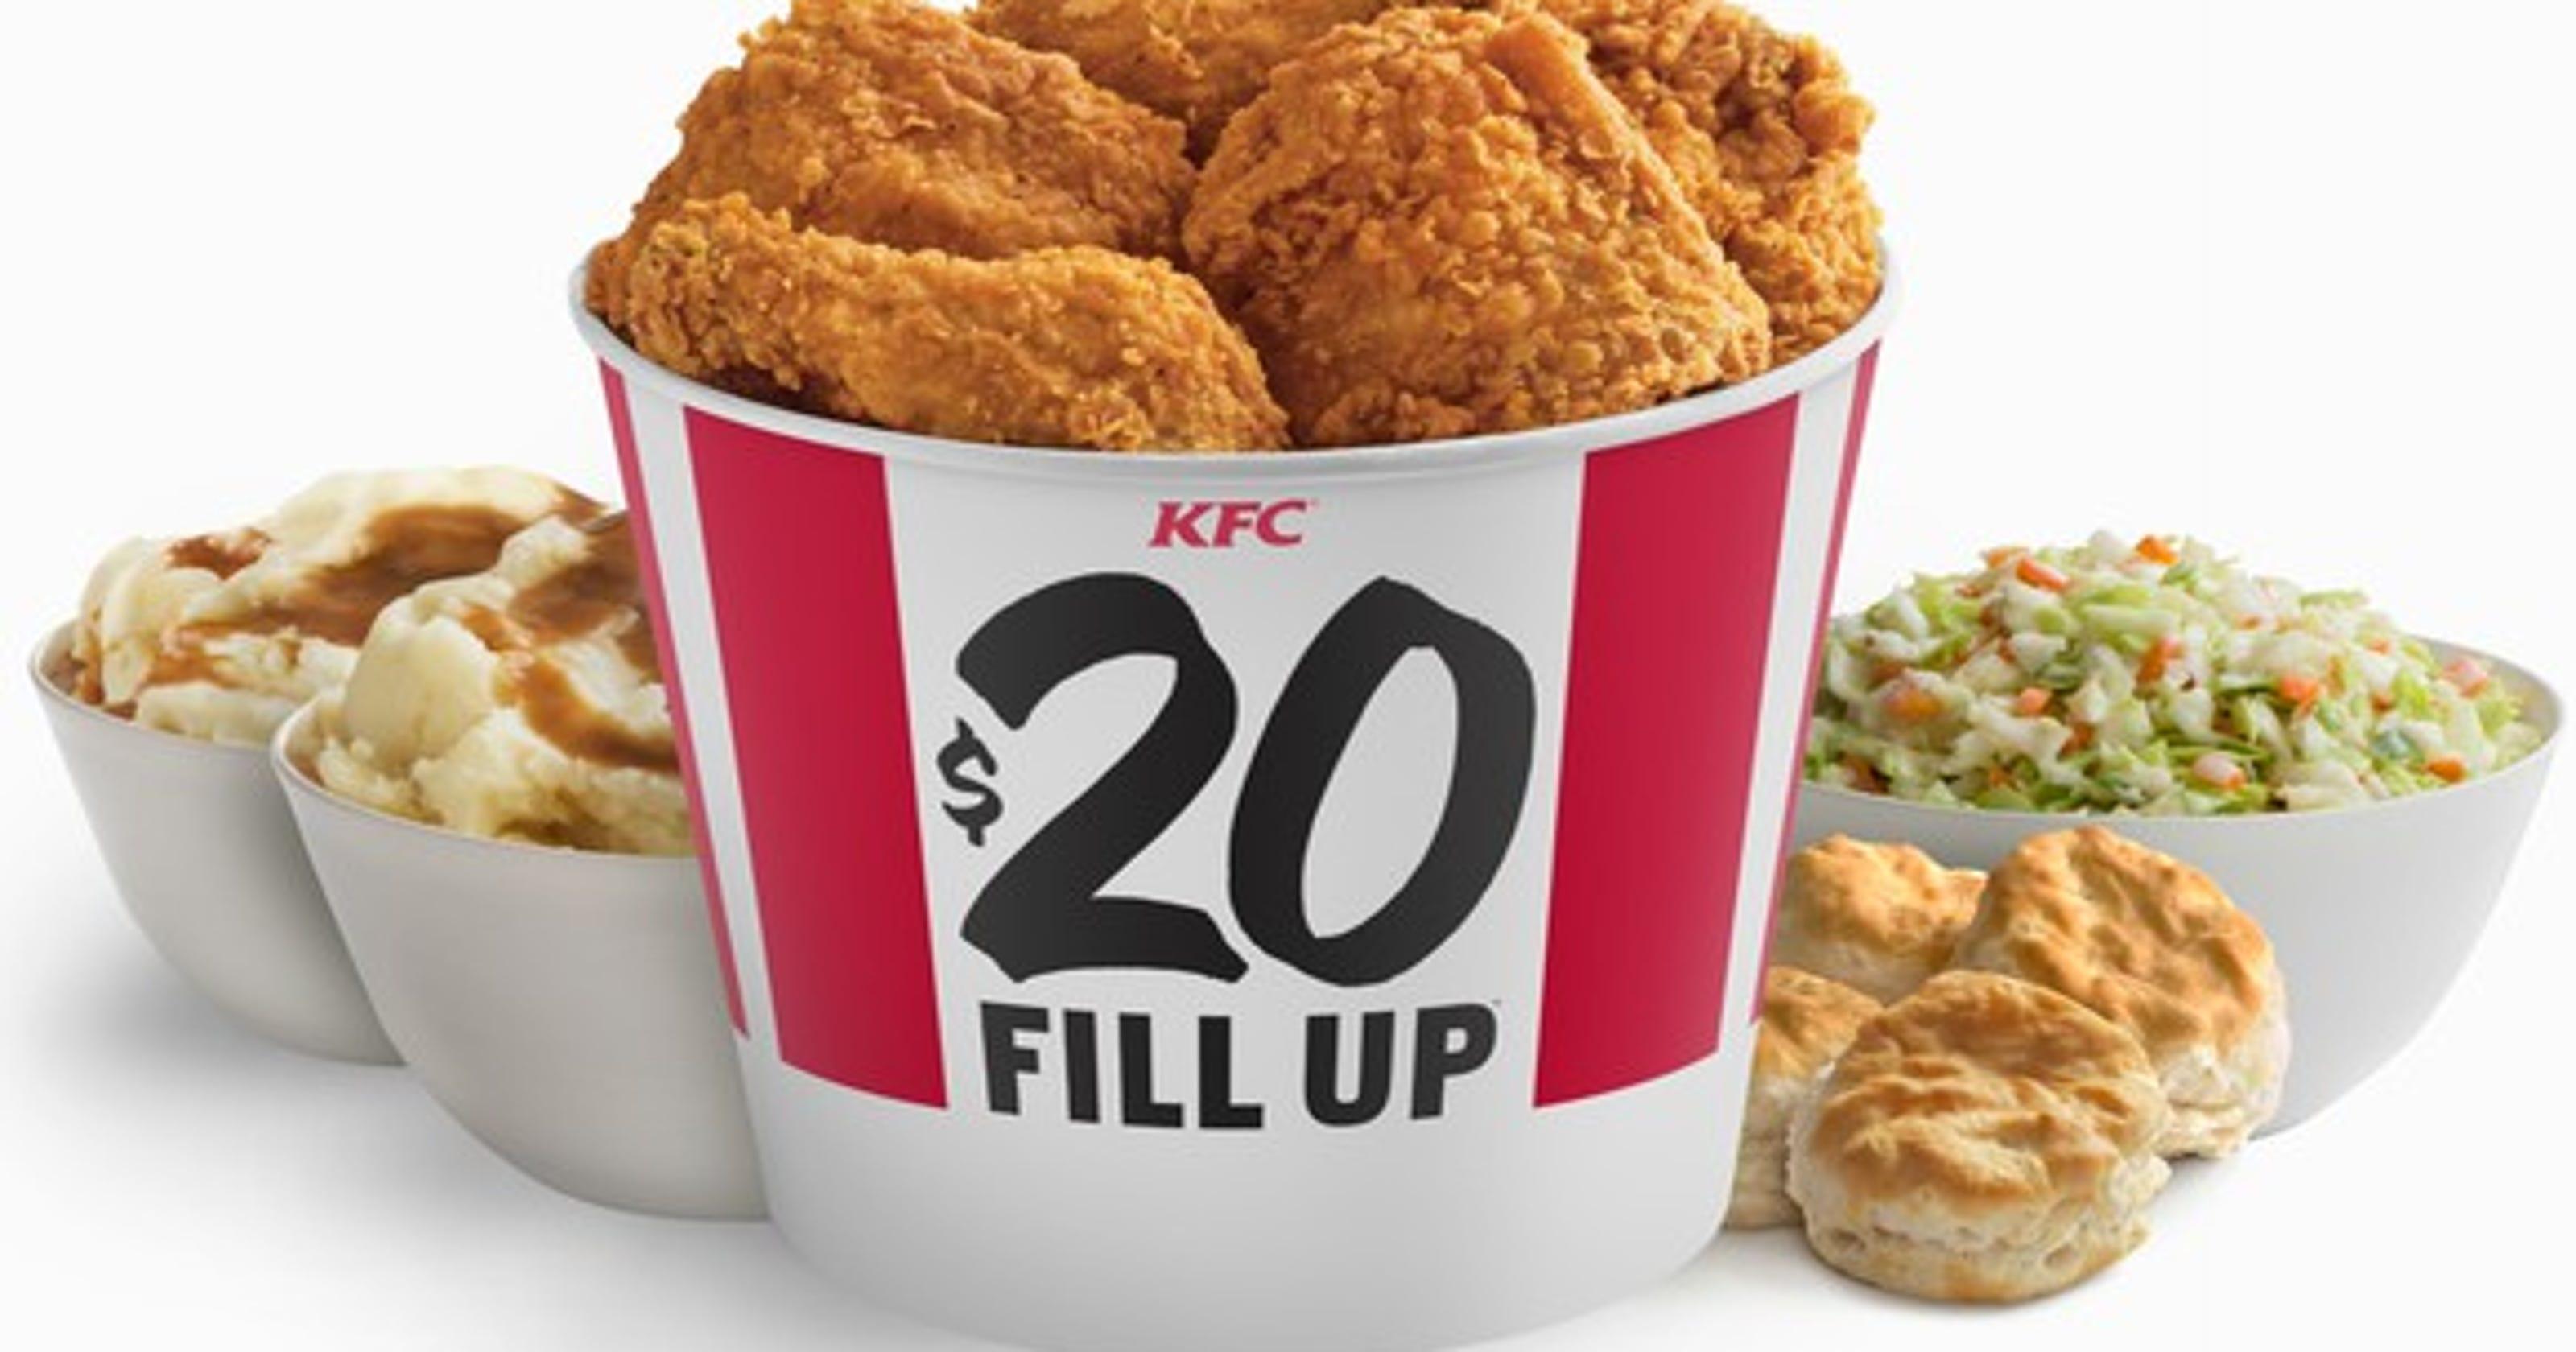 Dutchess County woman's $20 million KFC lawsuit dismissed